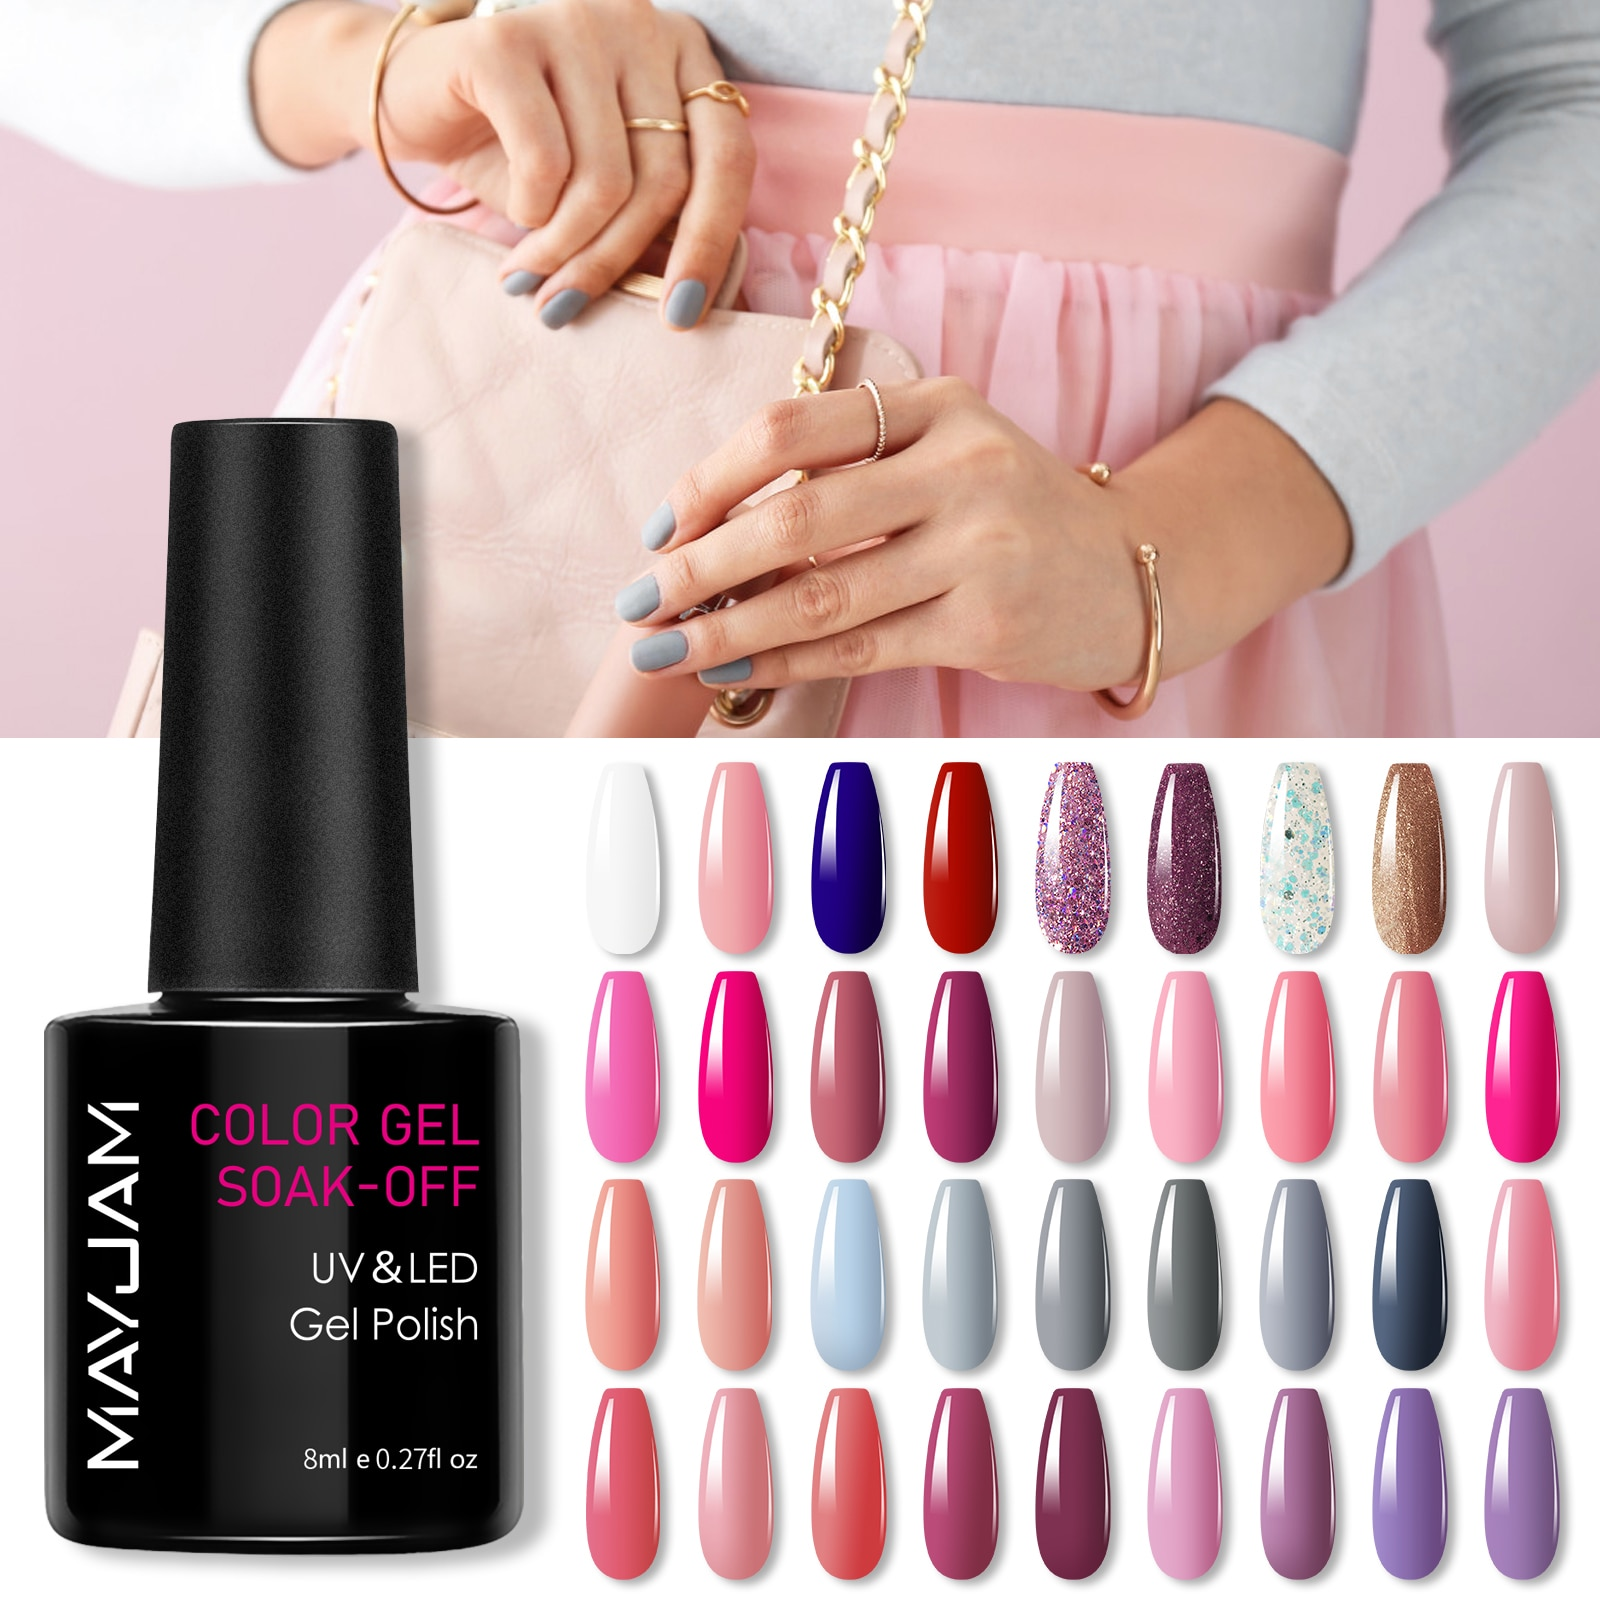 8ml MAYJAM Nail Gel Summer Color Series Semi Permanent Varnish Soak Off UV Gel Nail Polish Lacquer Top Base Coat Nail Art Design недорого